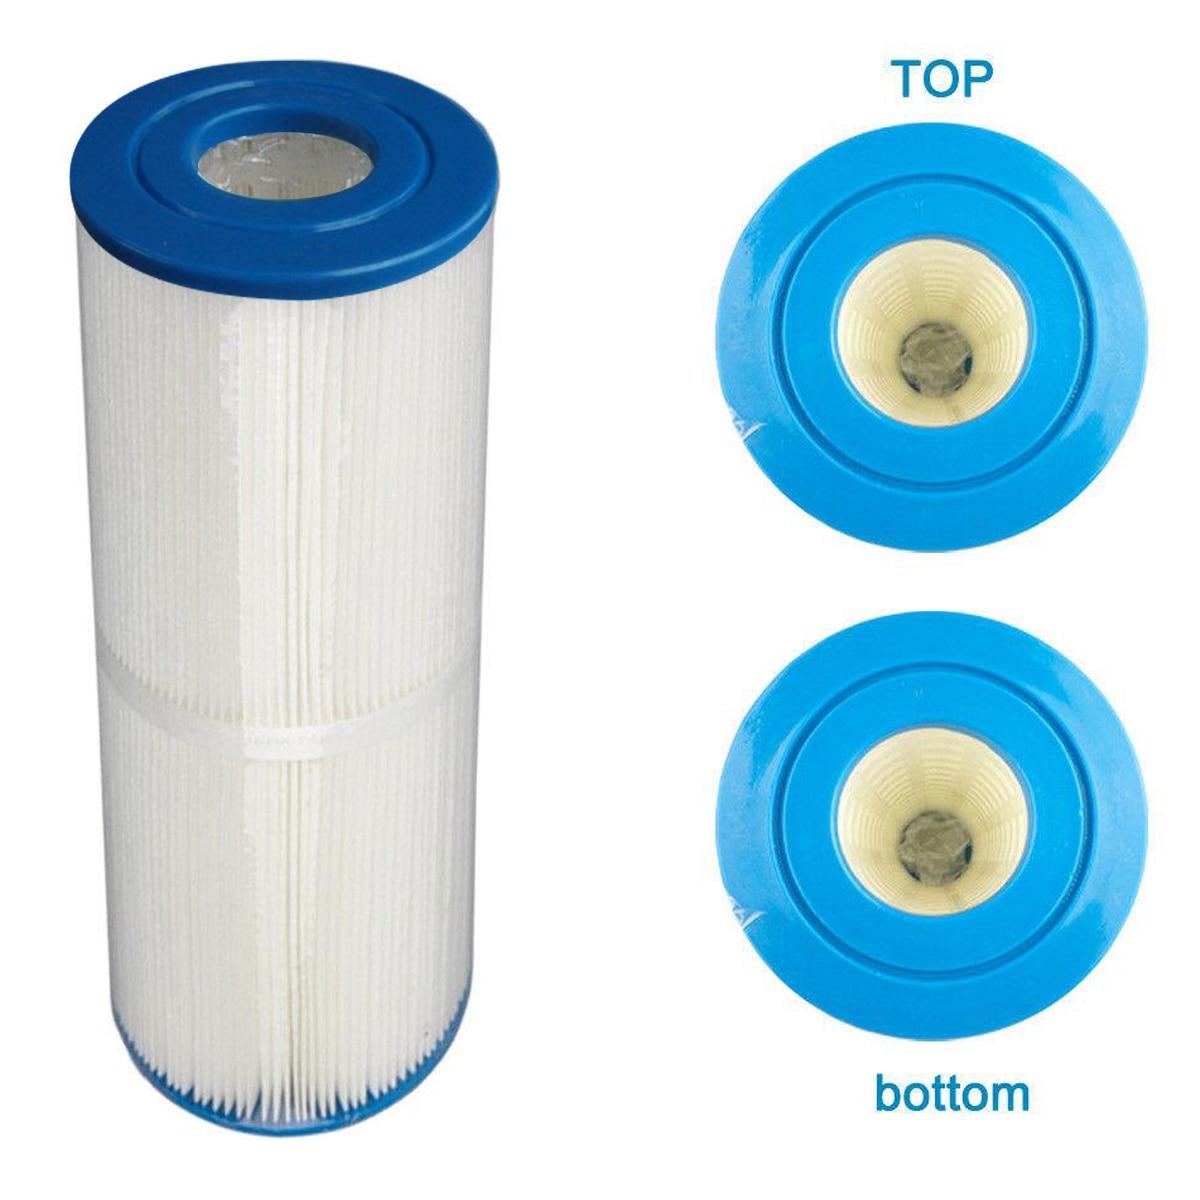 Proglam 1//2//4pcs Filter Cartridges Strainer for All Models Hot Tub Spas Swimming Pool for MSPA